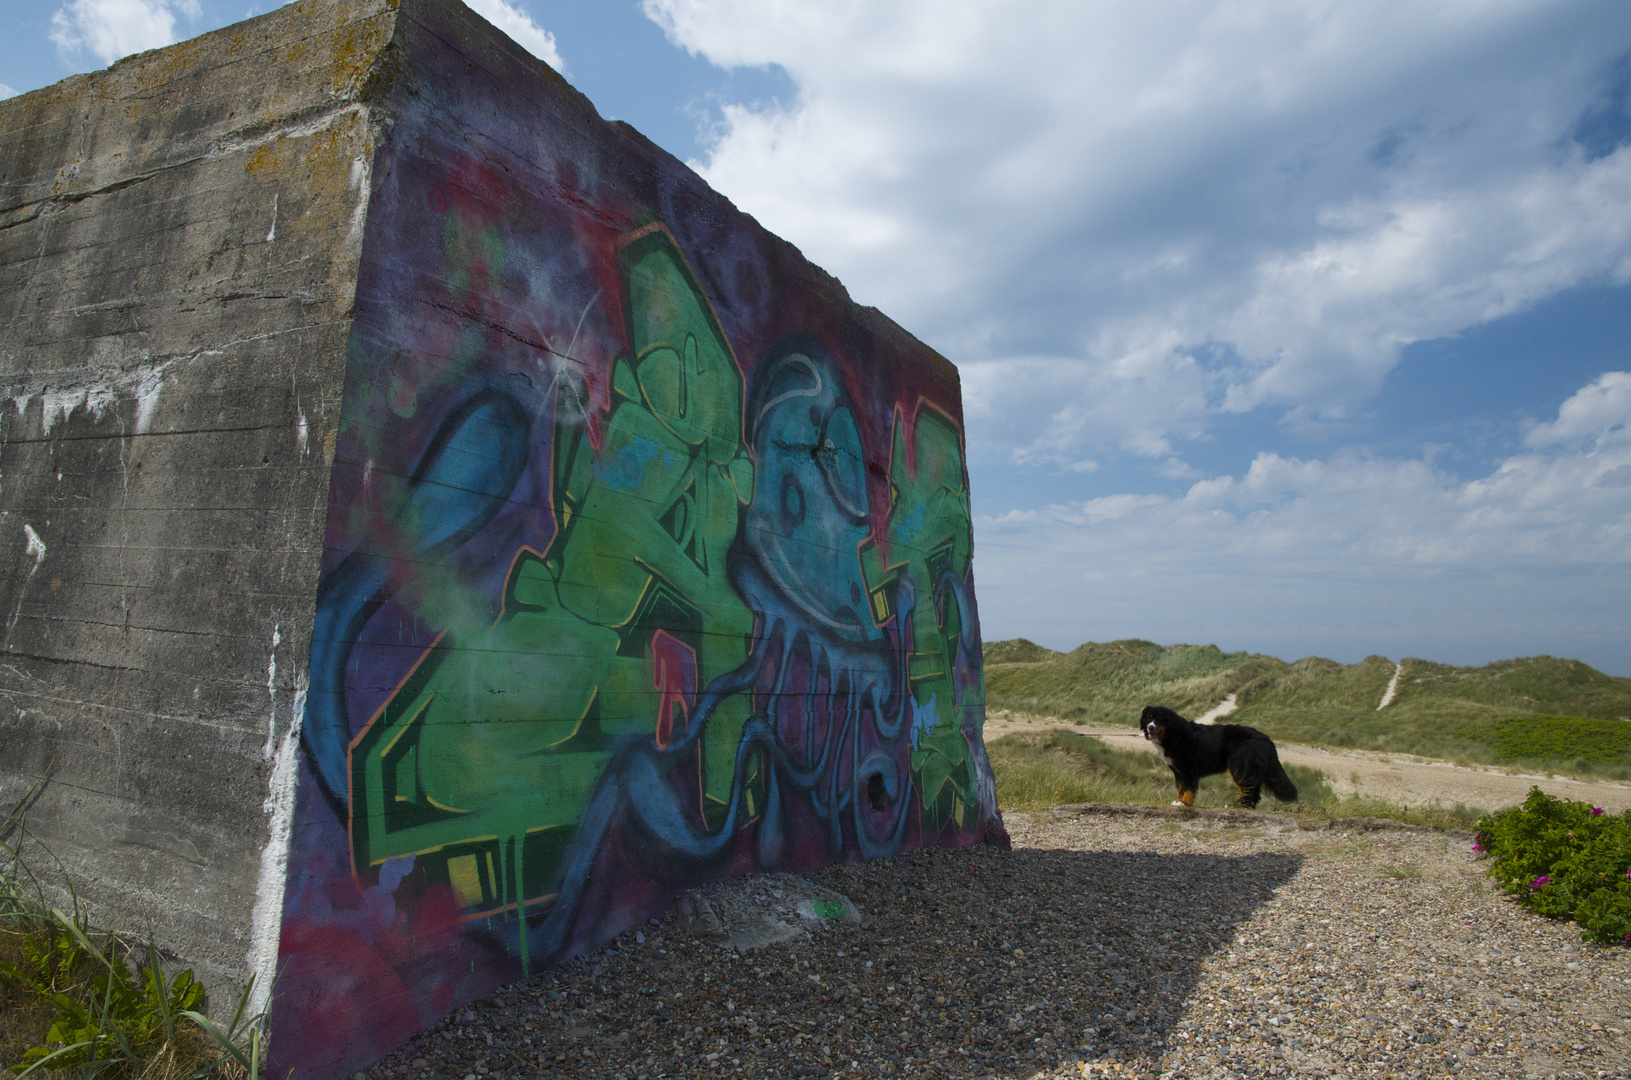 Noch ein verkünstelter Bunker